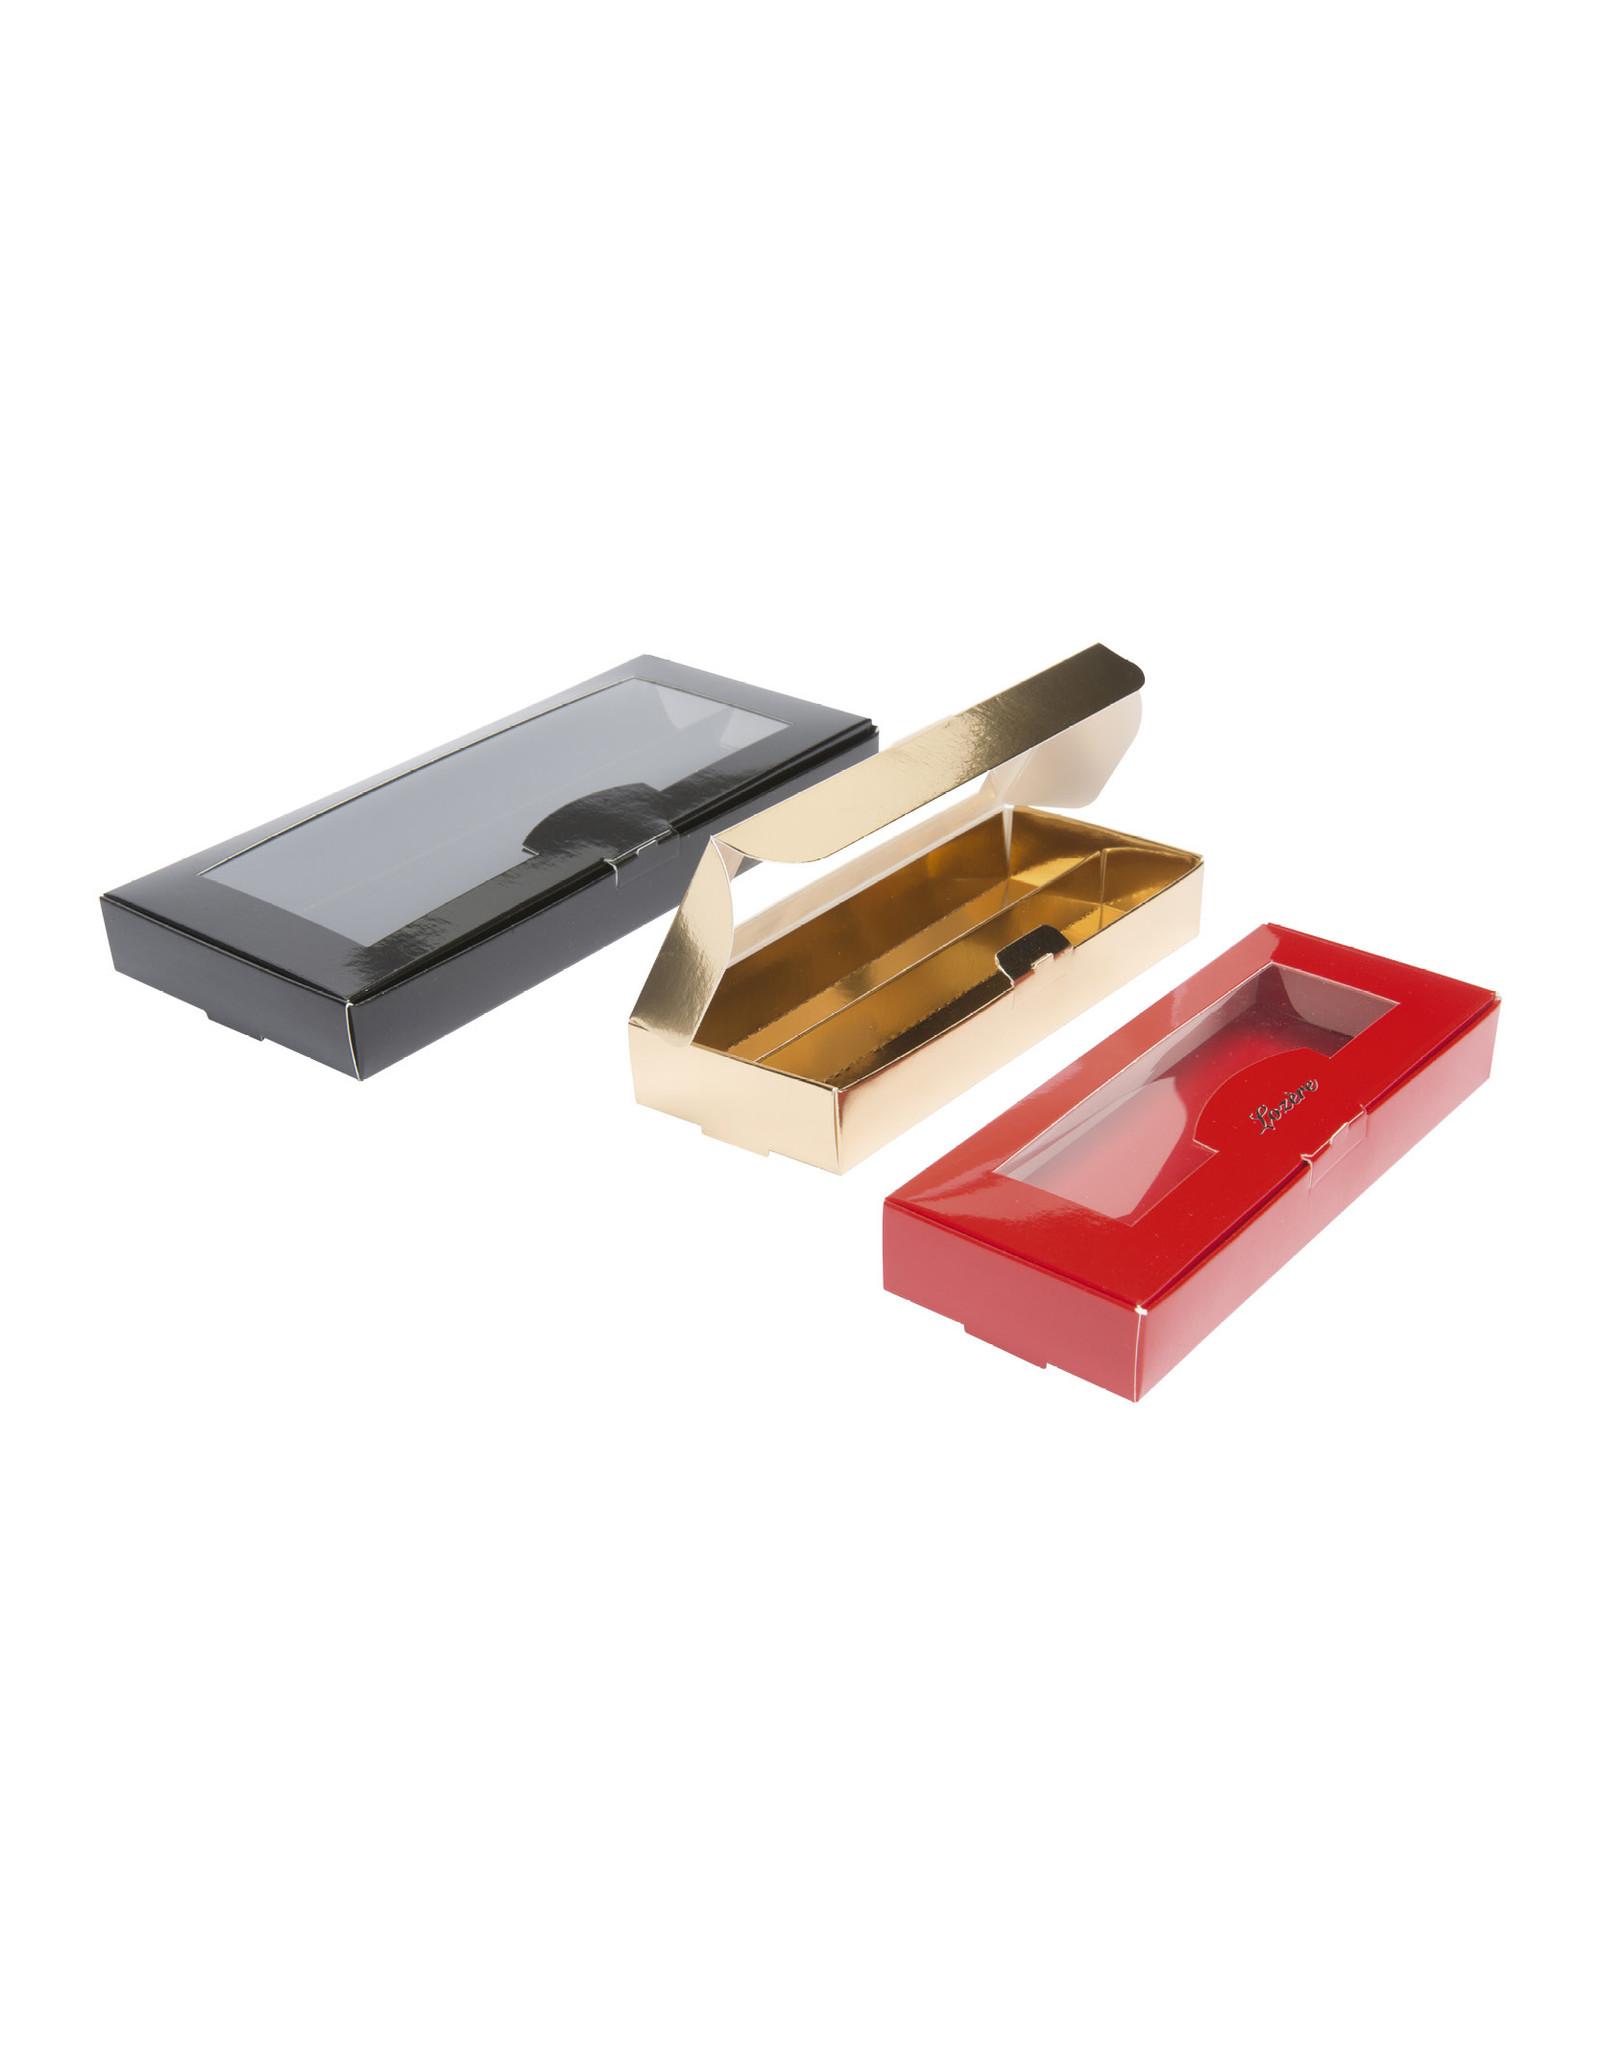 Parallel Box 15,8 x 6 x 2,2cm